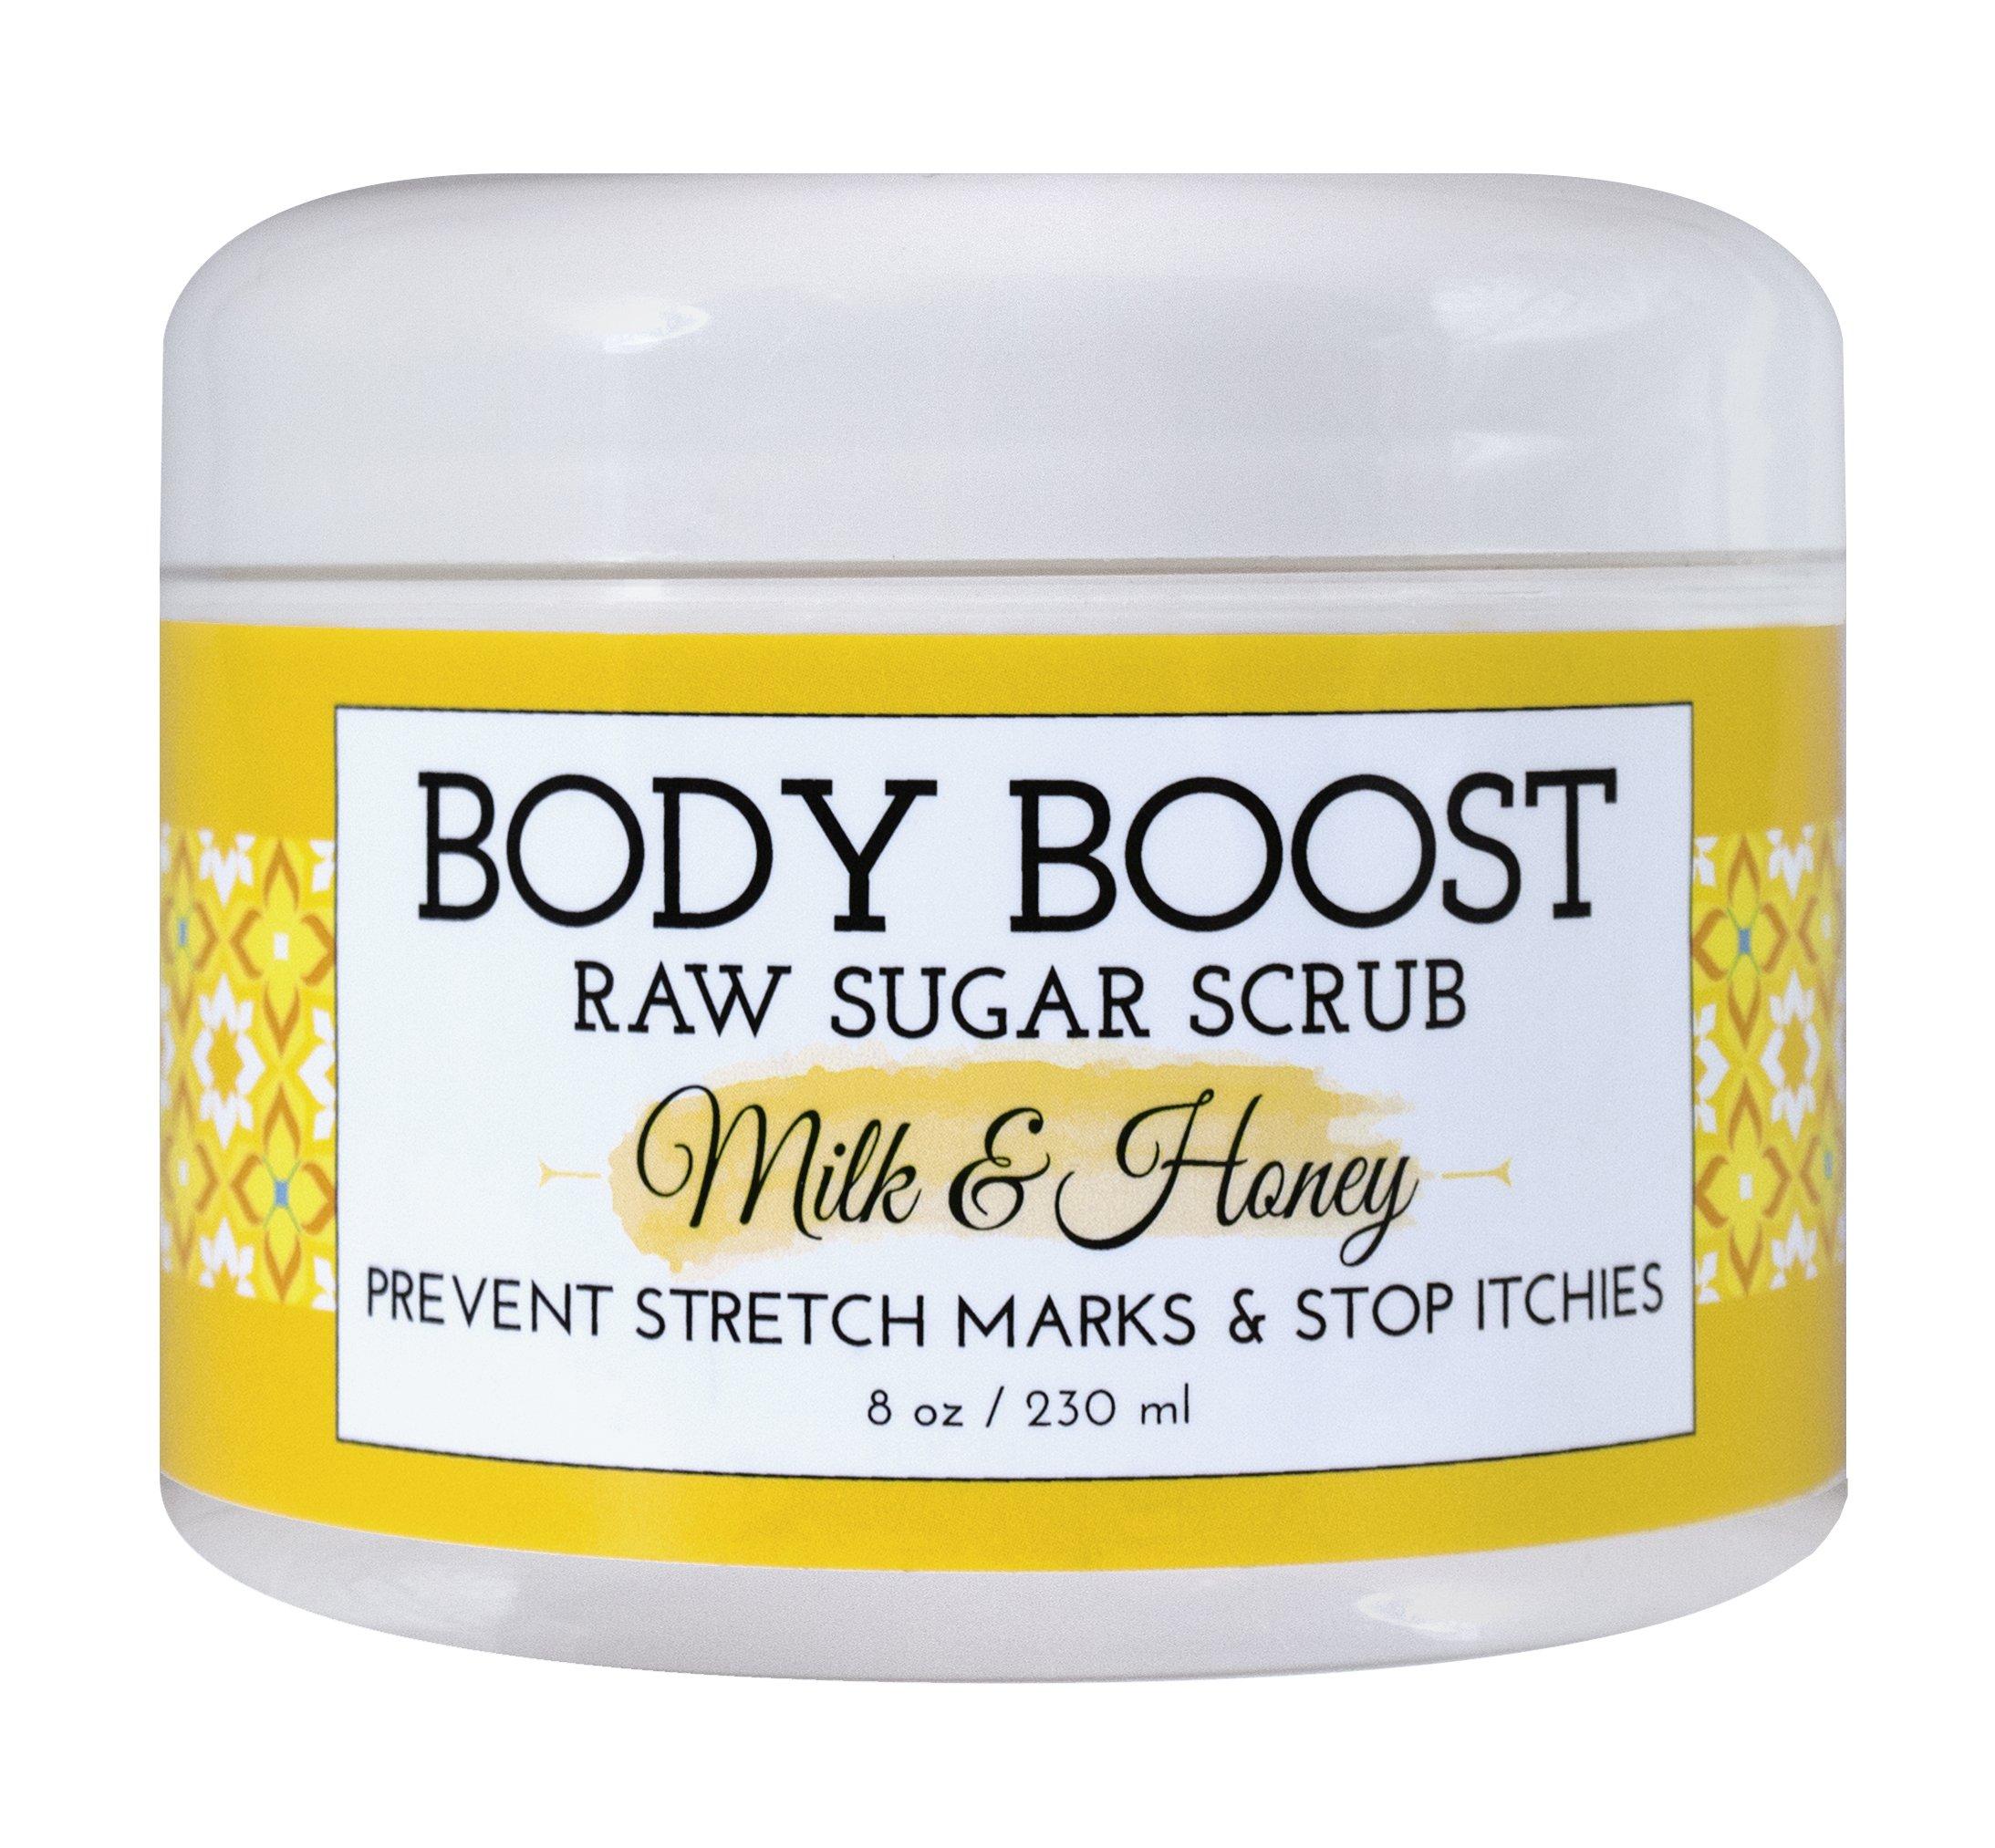 Body Boost Milk & Honey Sugar Scrub 8 oz- Pregnancy & Nursing Safe Skin Care